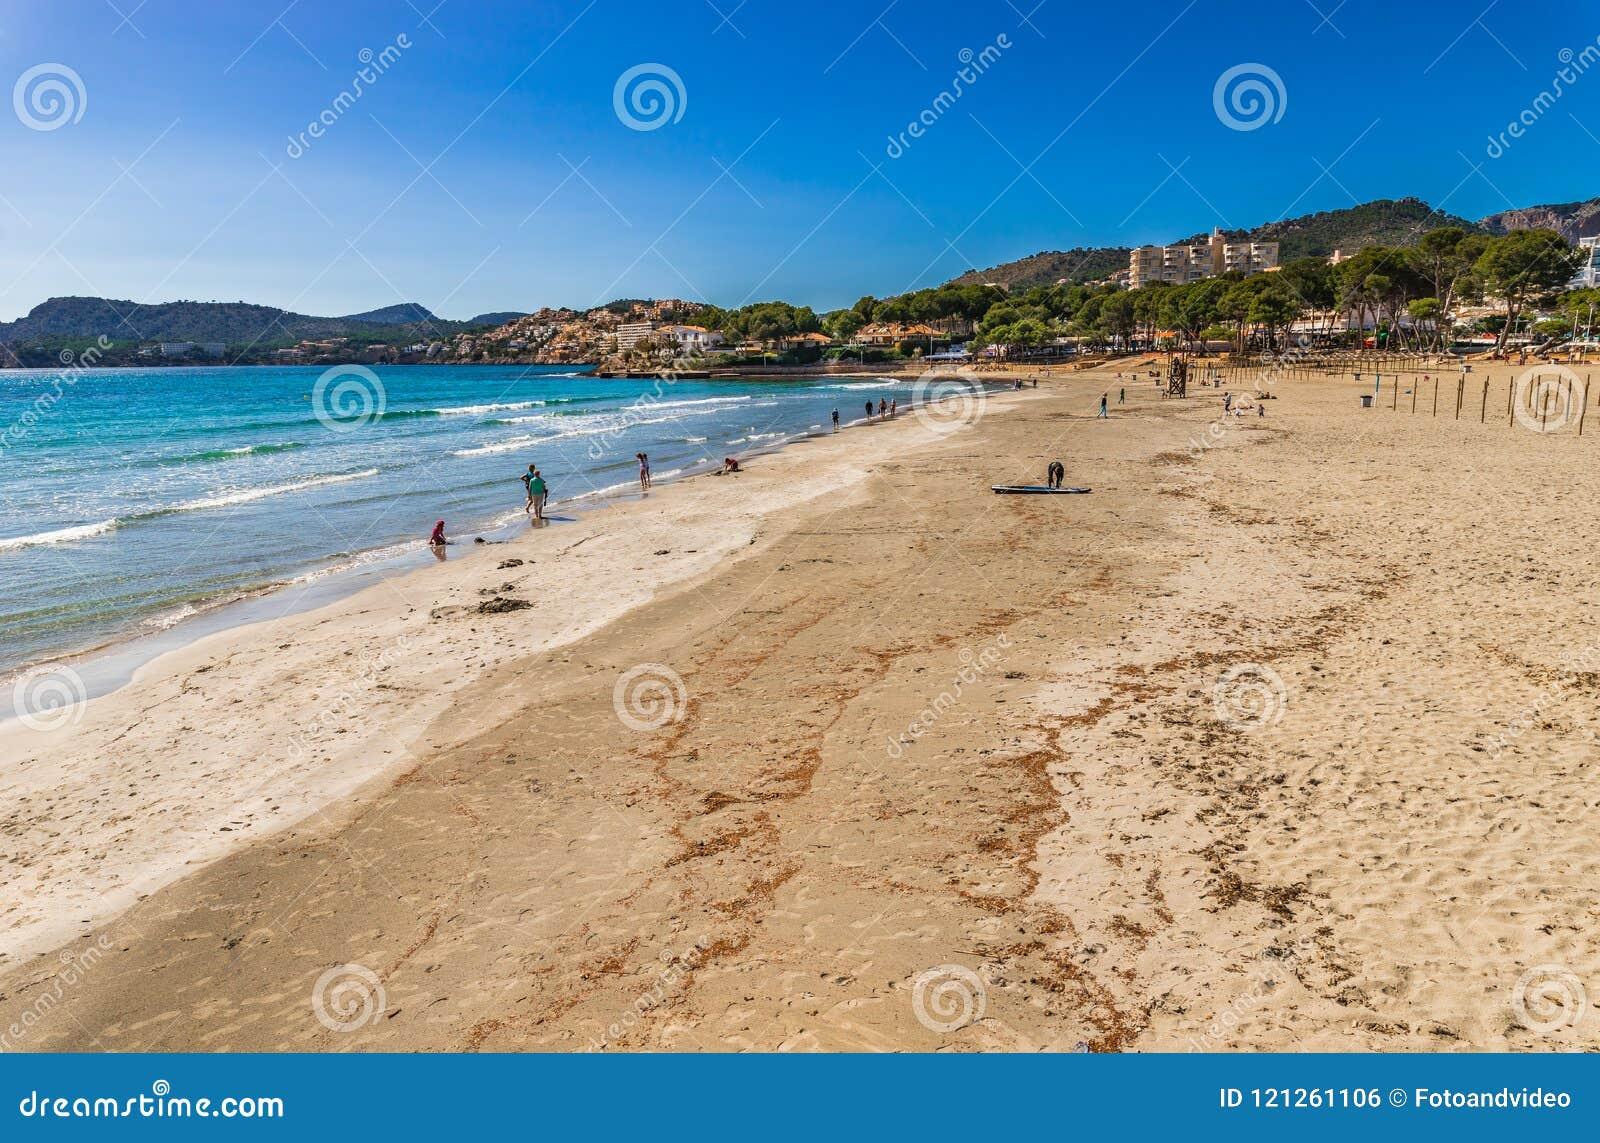 Seaside beach in Peguera on Mallorca island, Spain Mediterranean Sea